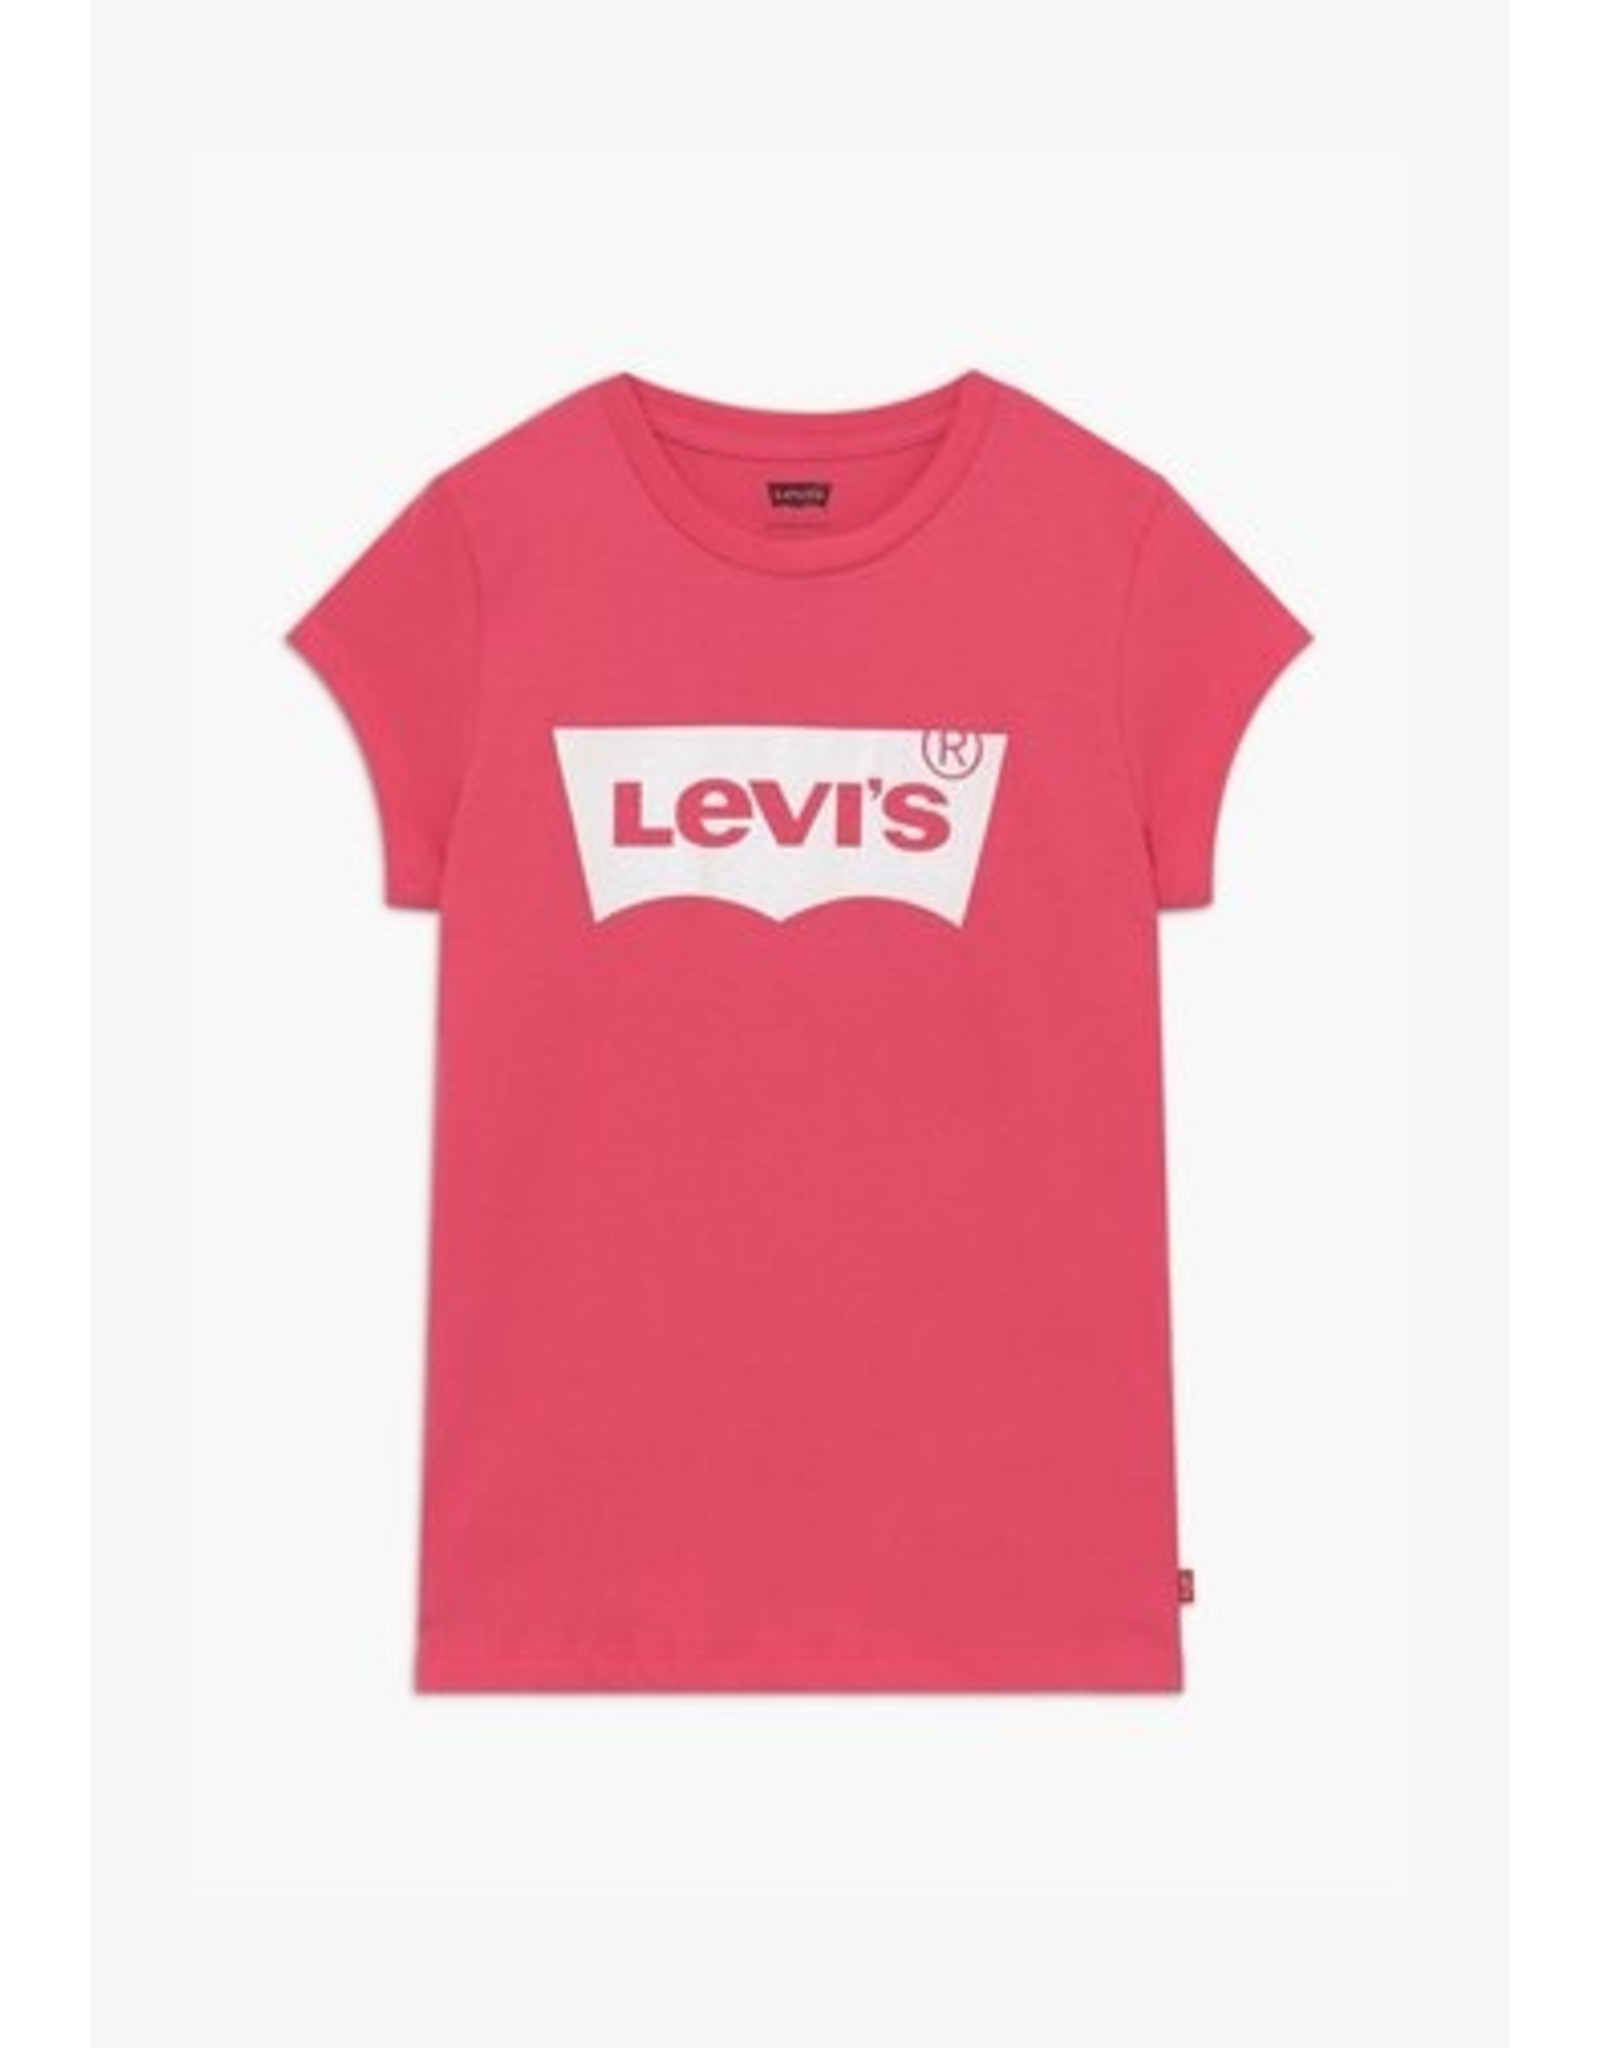 LEVI'S LEVI'S short sleeve Batwing Tee Tea Tree Pink